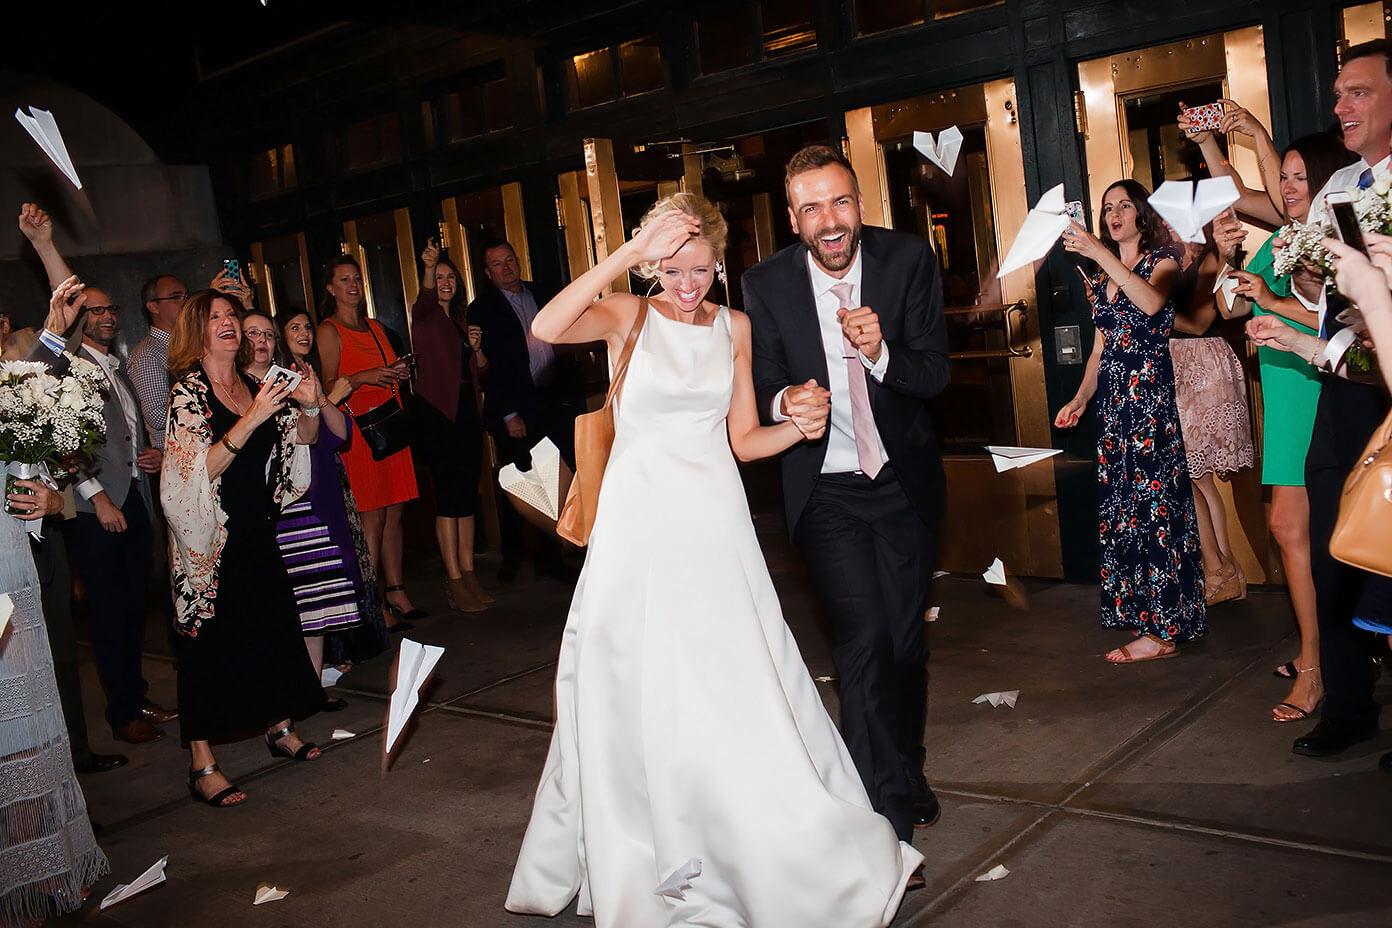 Barclay and Ali Martin Union Station Kansas City Wedding